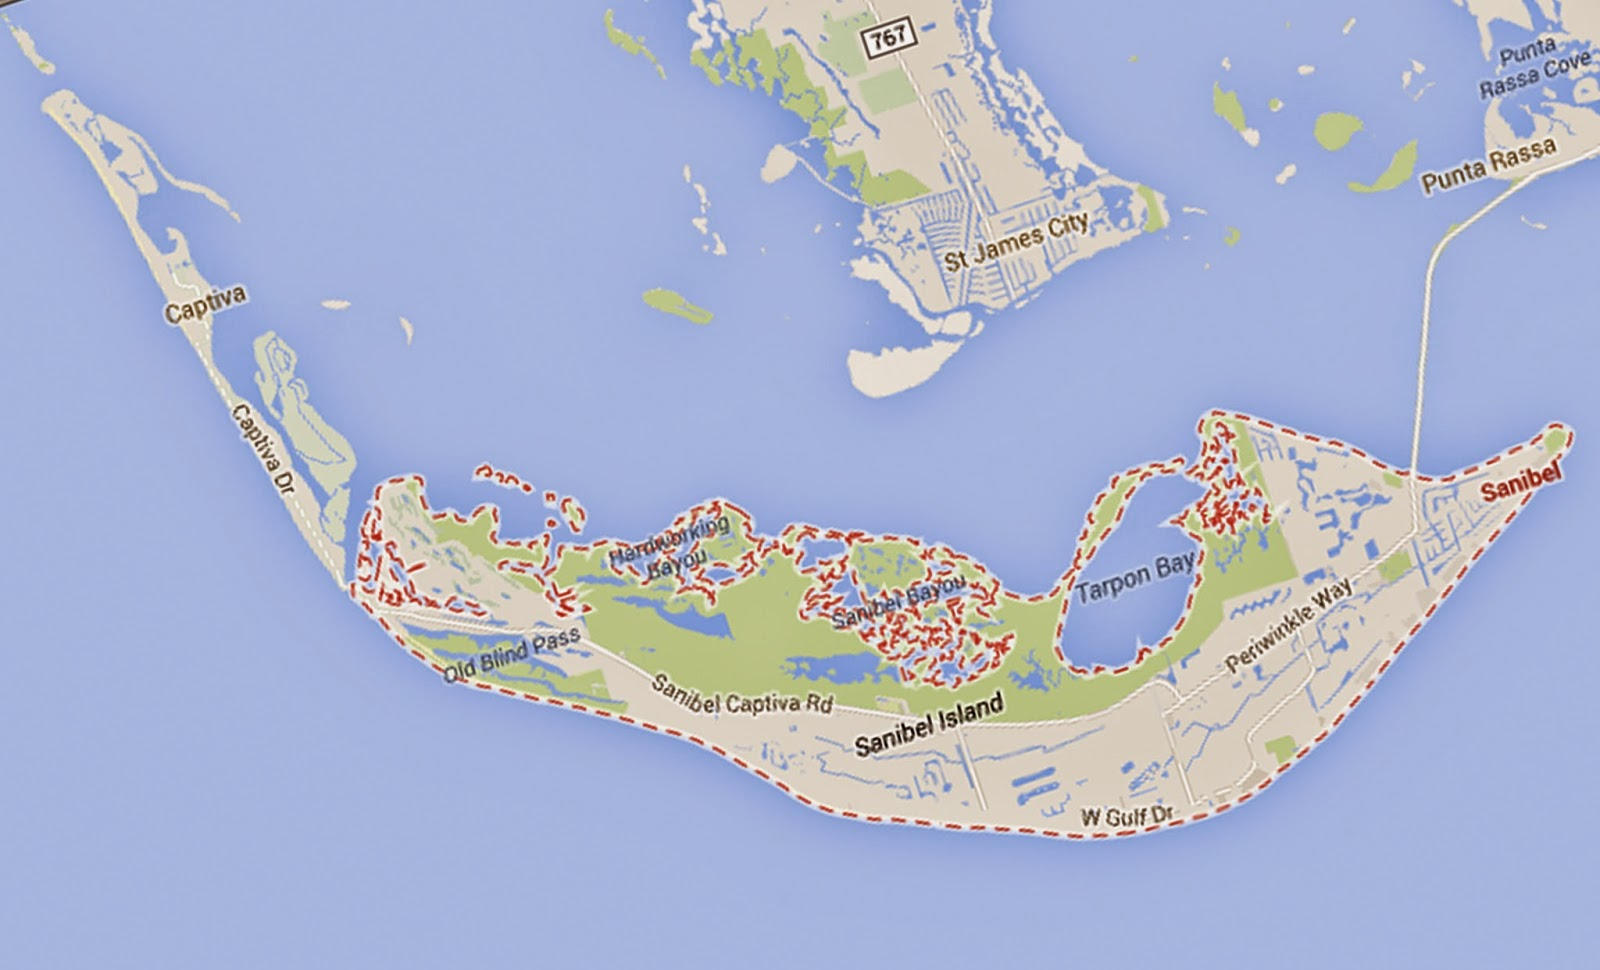 Google Maps North Captiva Island